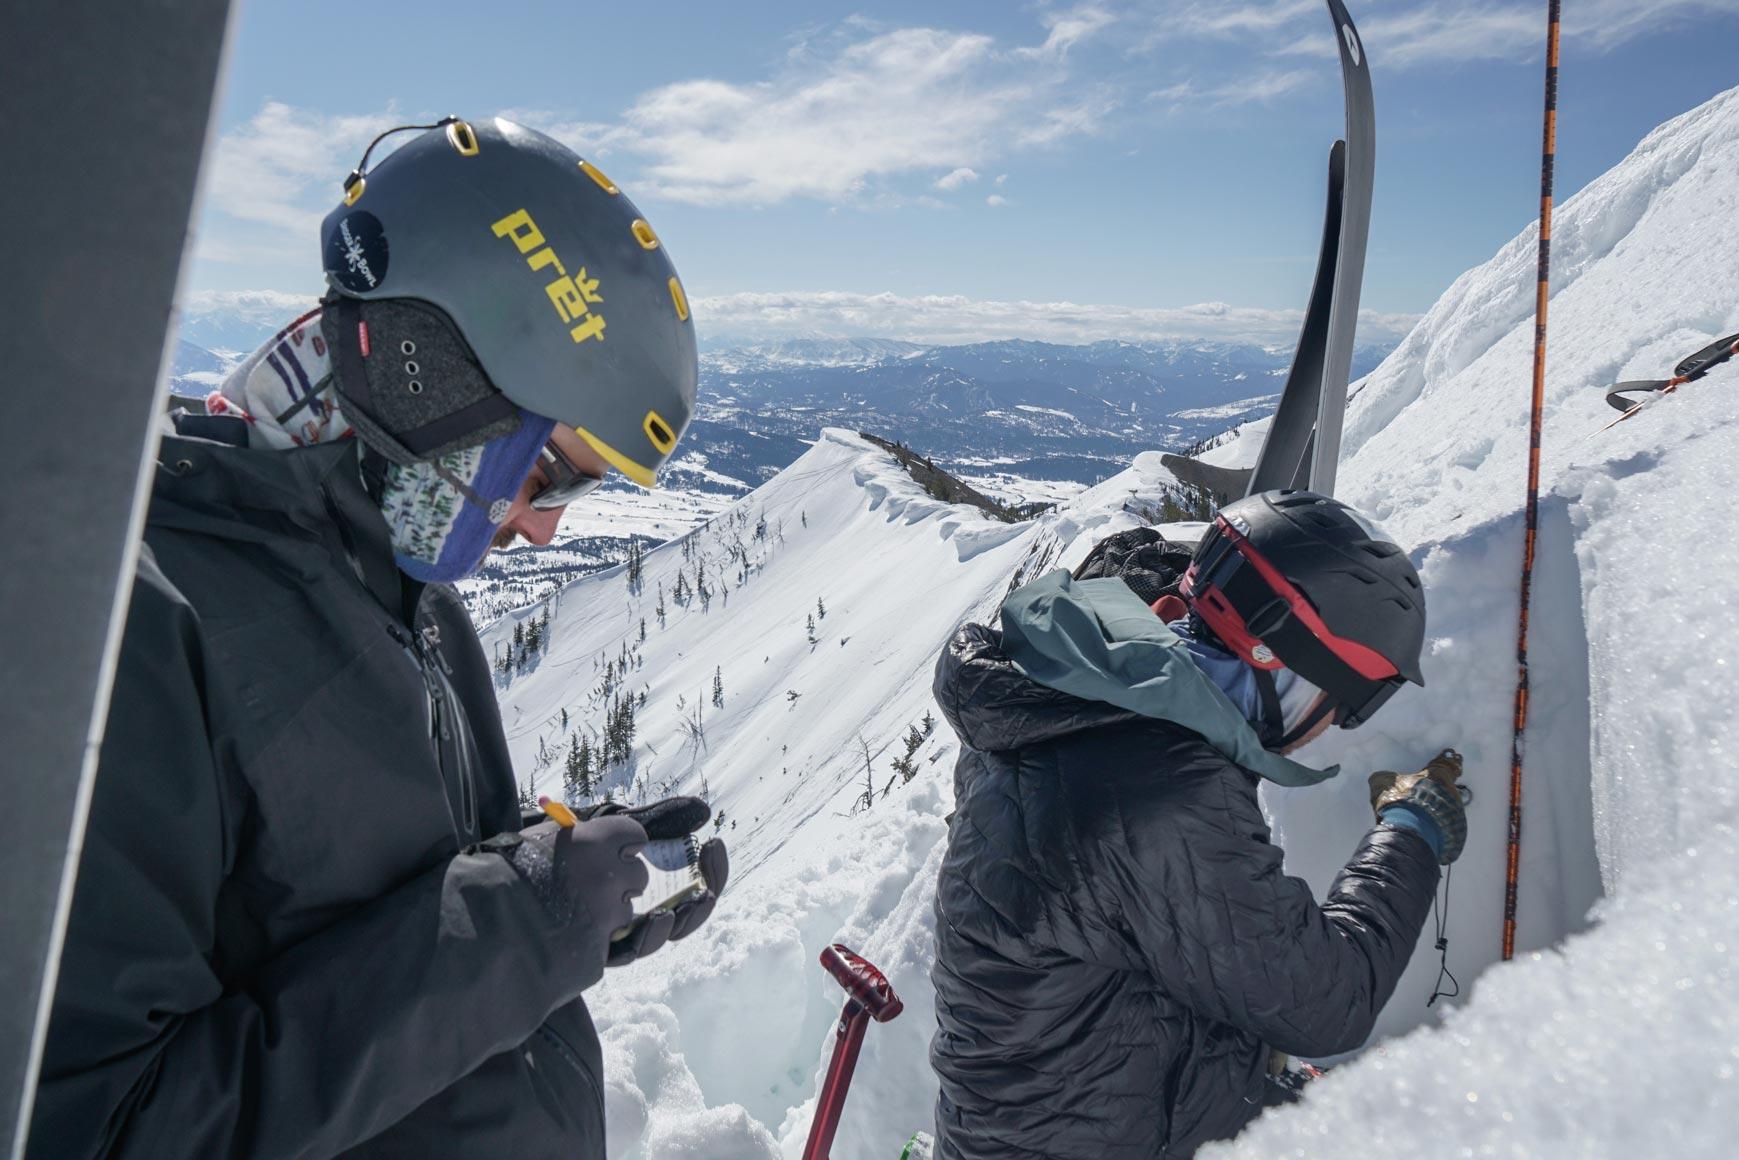 Andrew recording Alex's data in snowpit